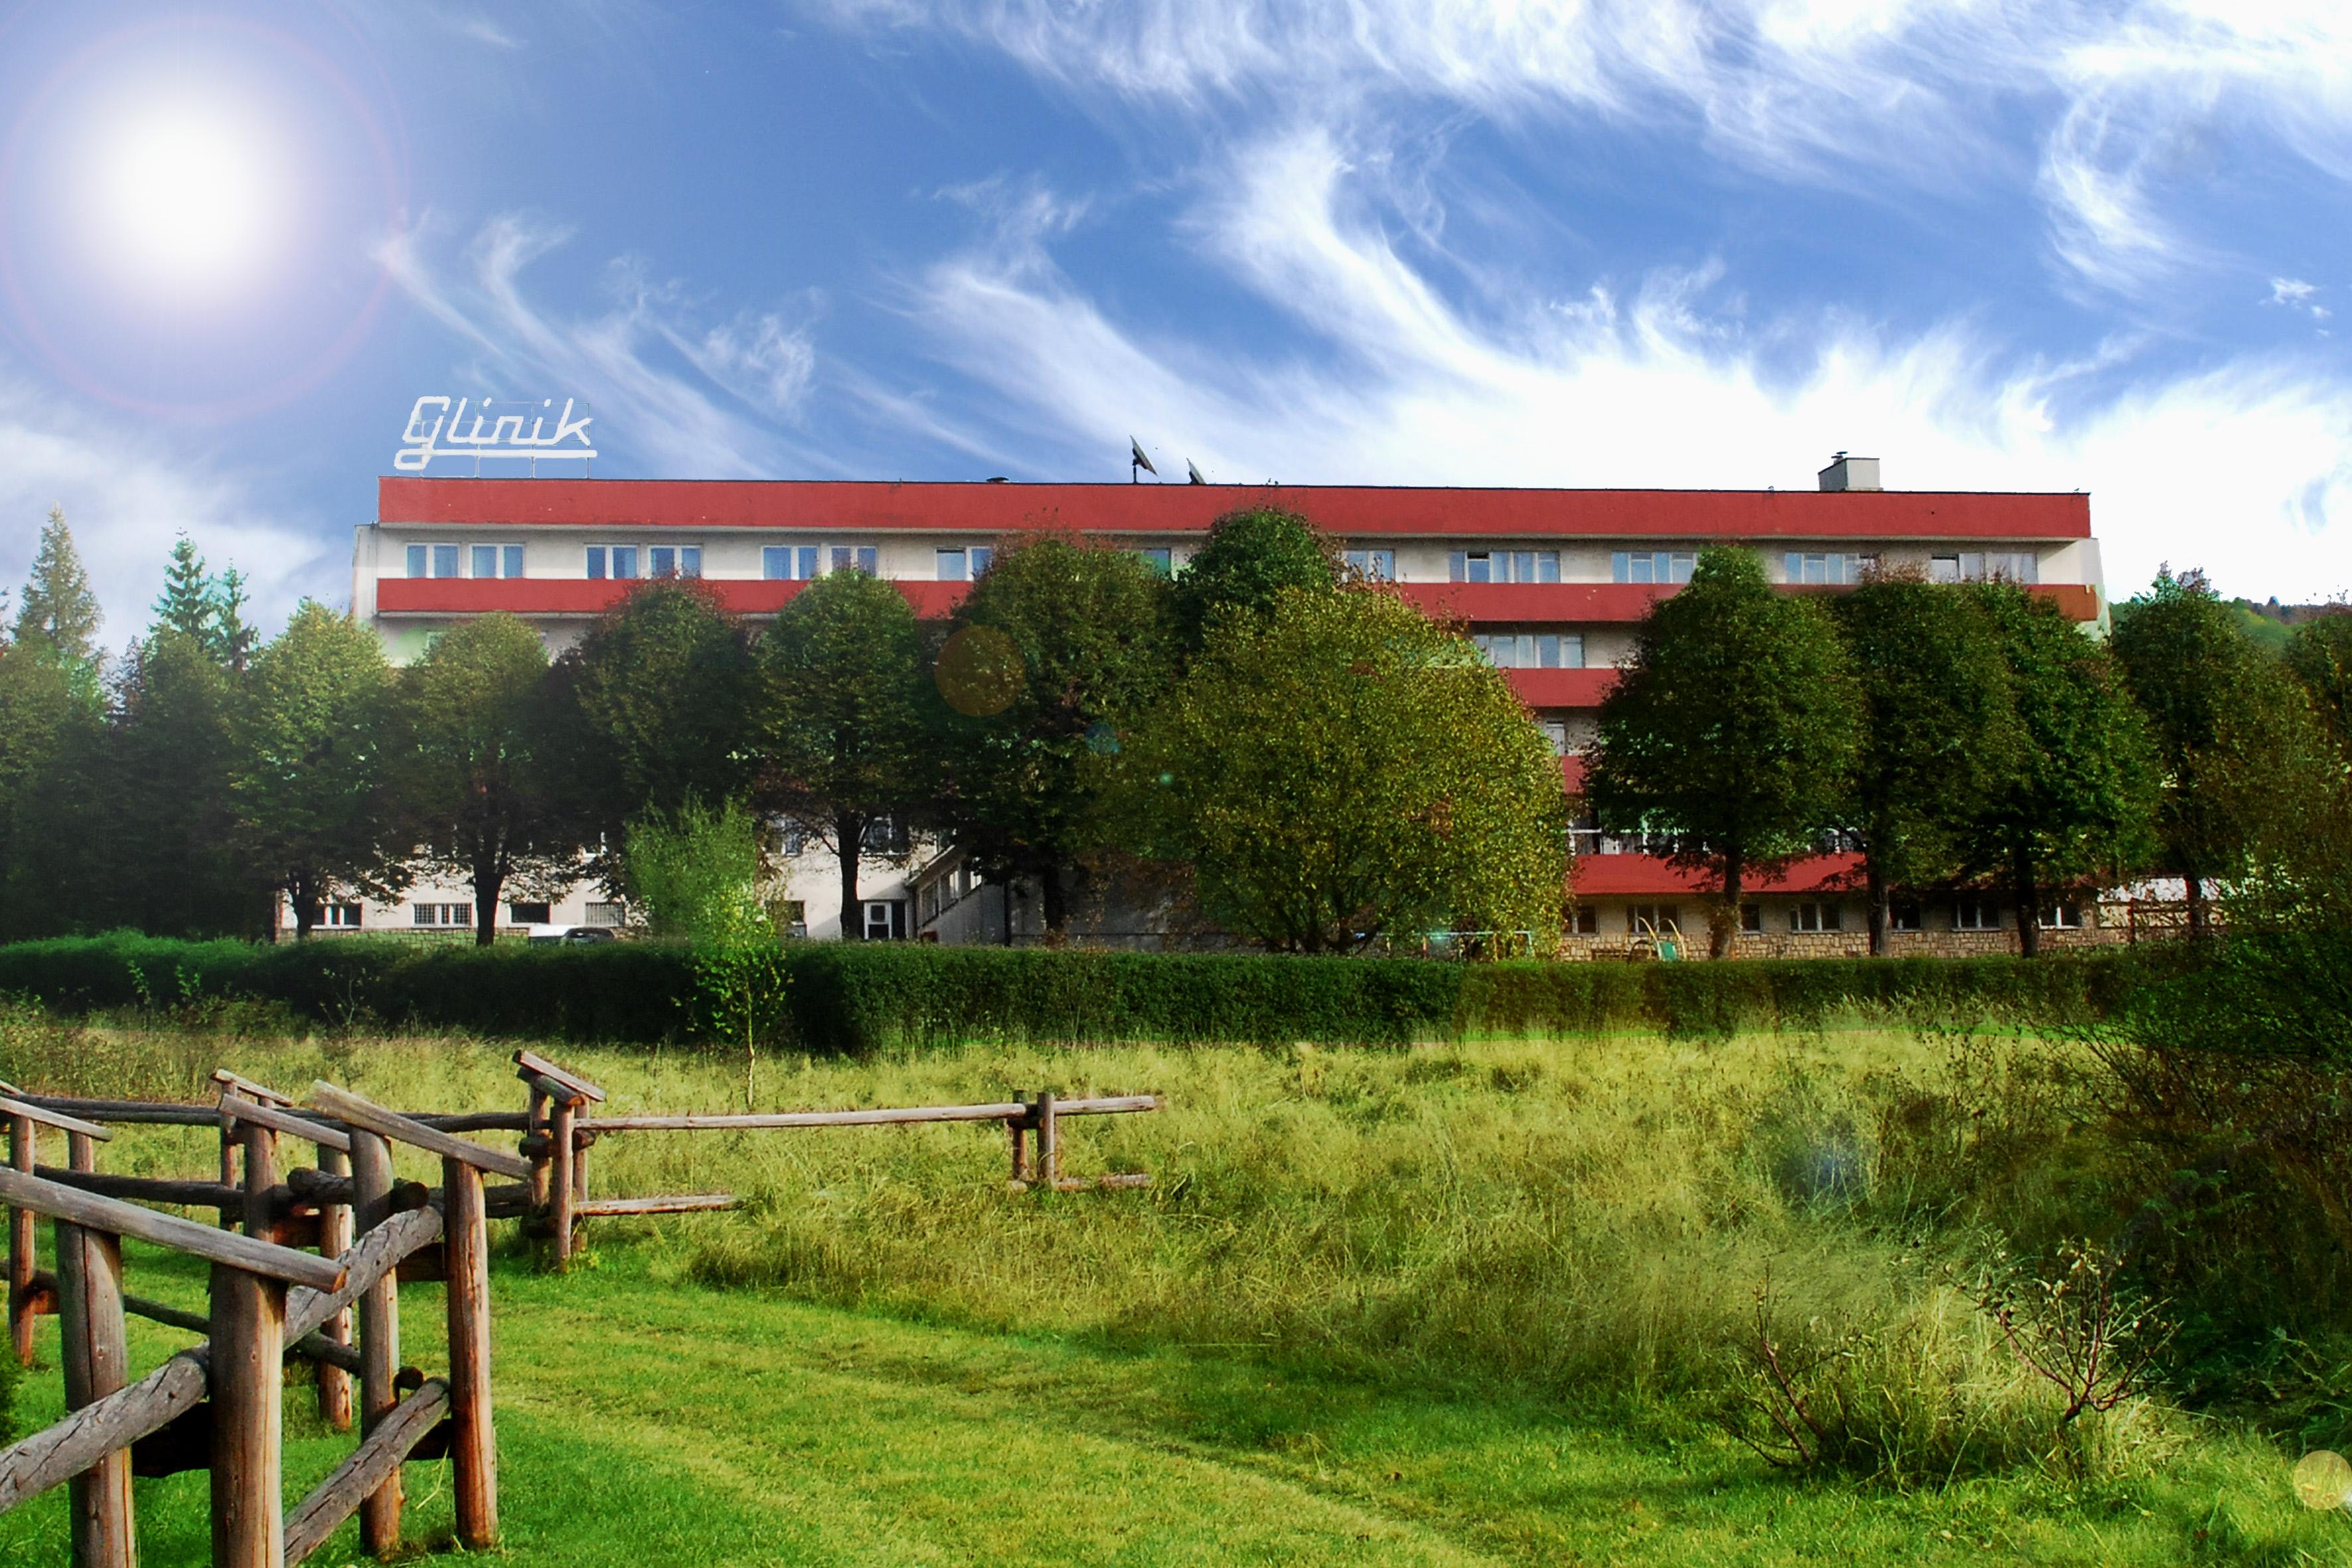 glinik_front- budynek